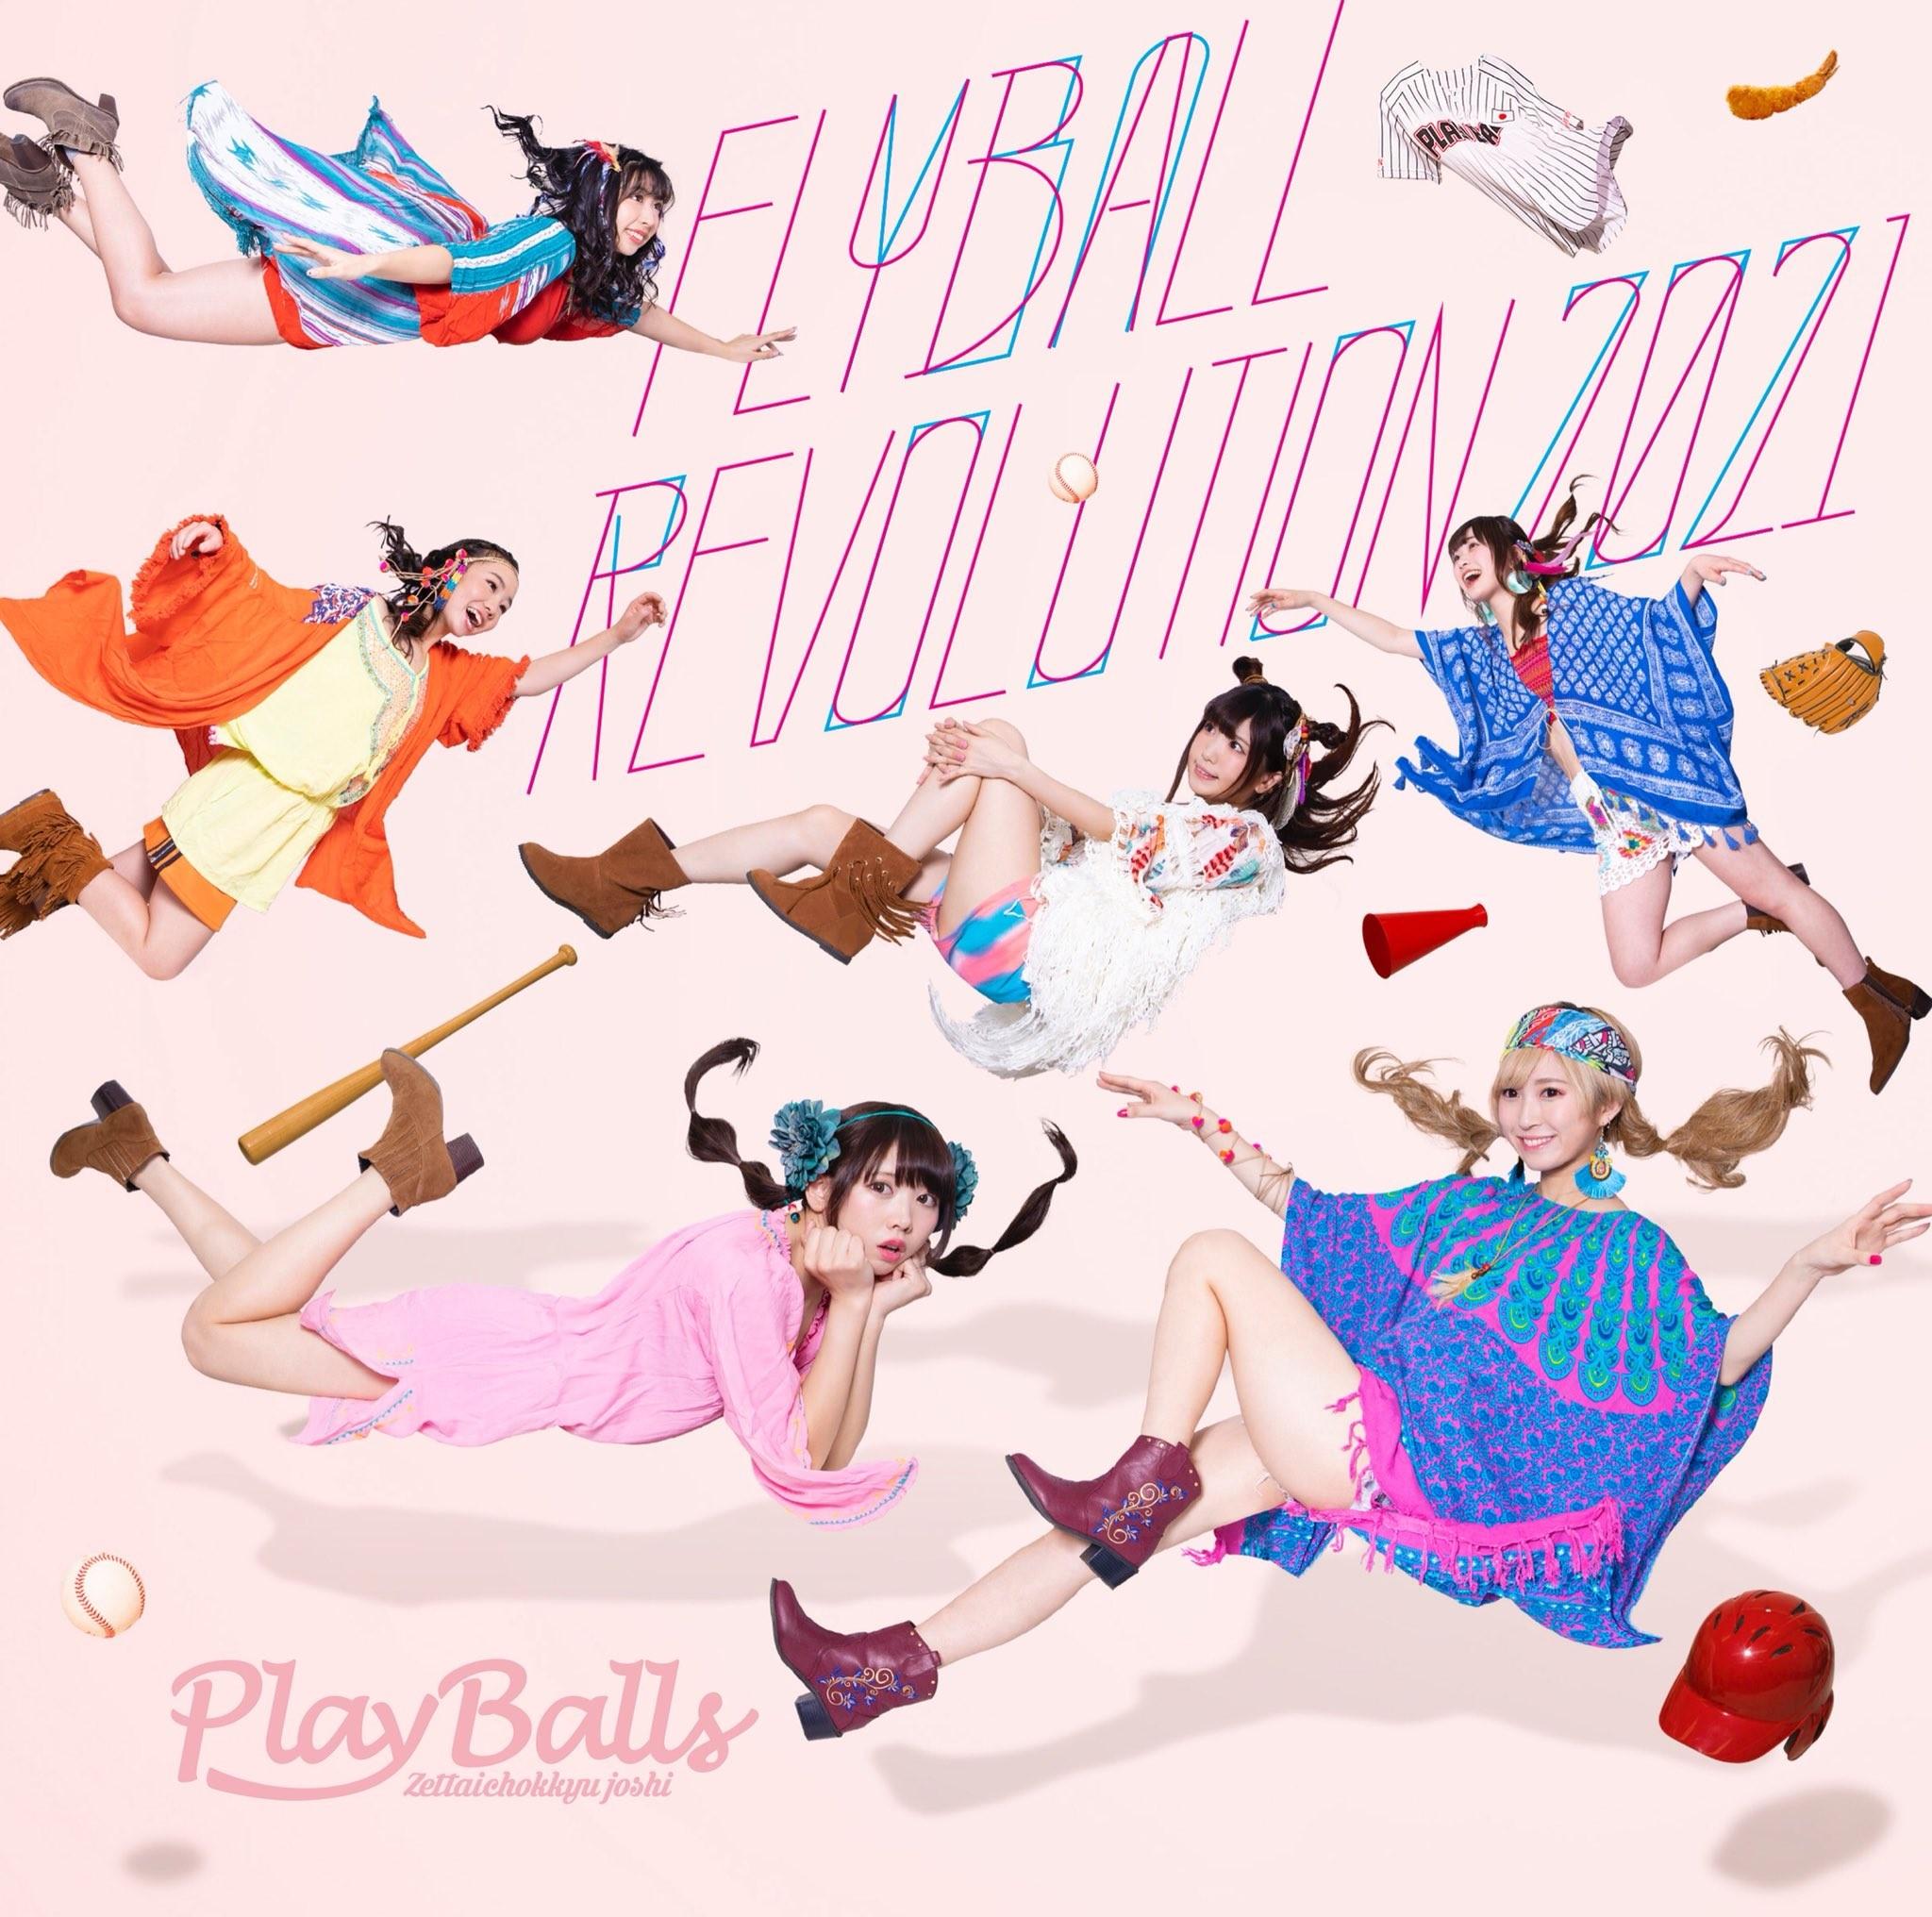 Zettai Chokkyu Joshi! Playballs (絶対直球女子!プレイボールズ ) – Flyball Revolution 2021 (フライボールレボリューション2021) [FLAC / CD] [2018.12.29]